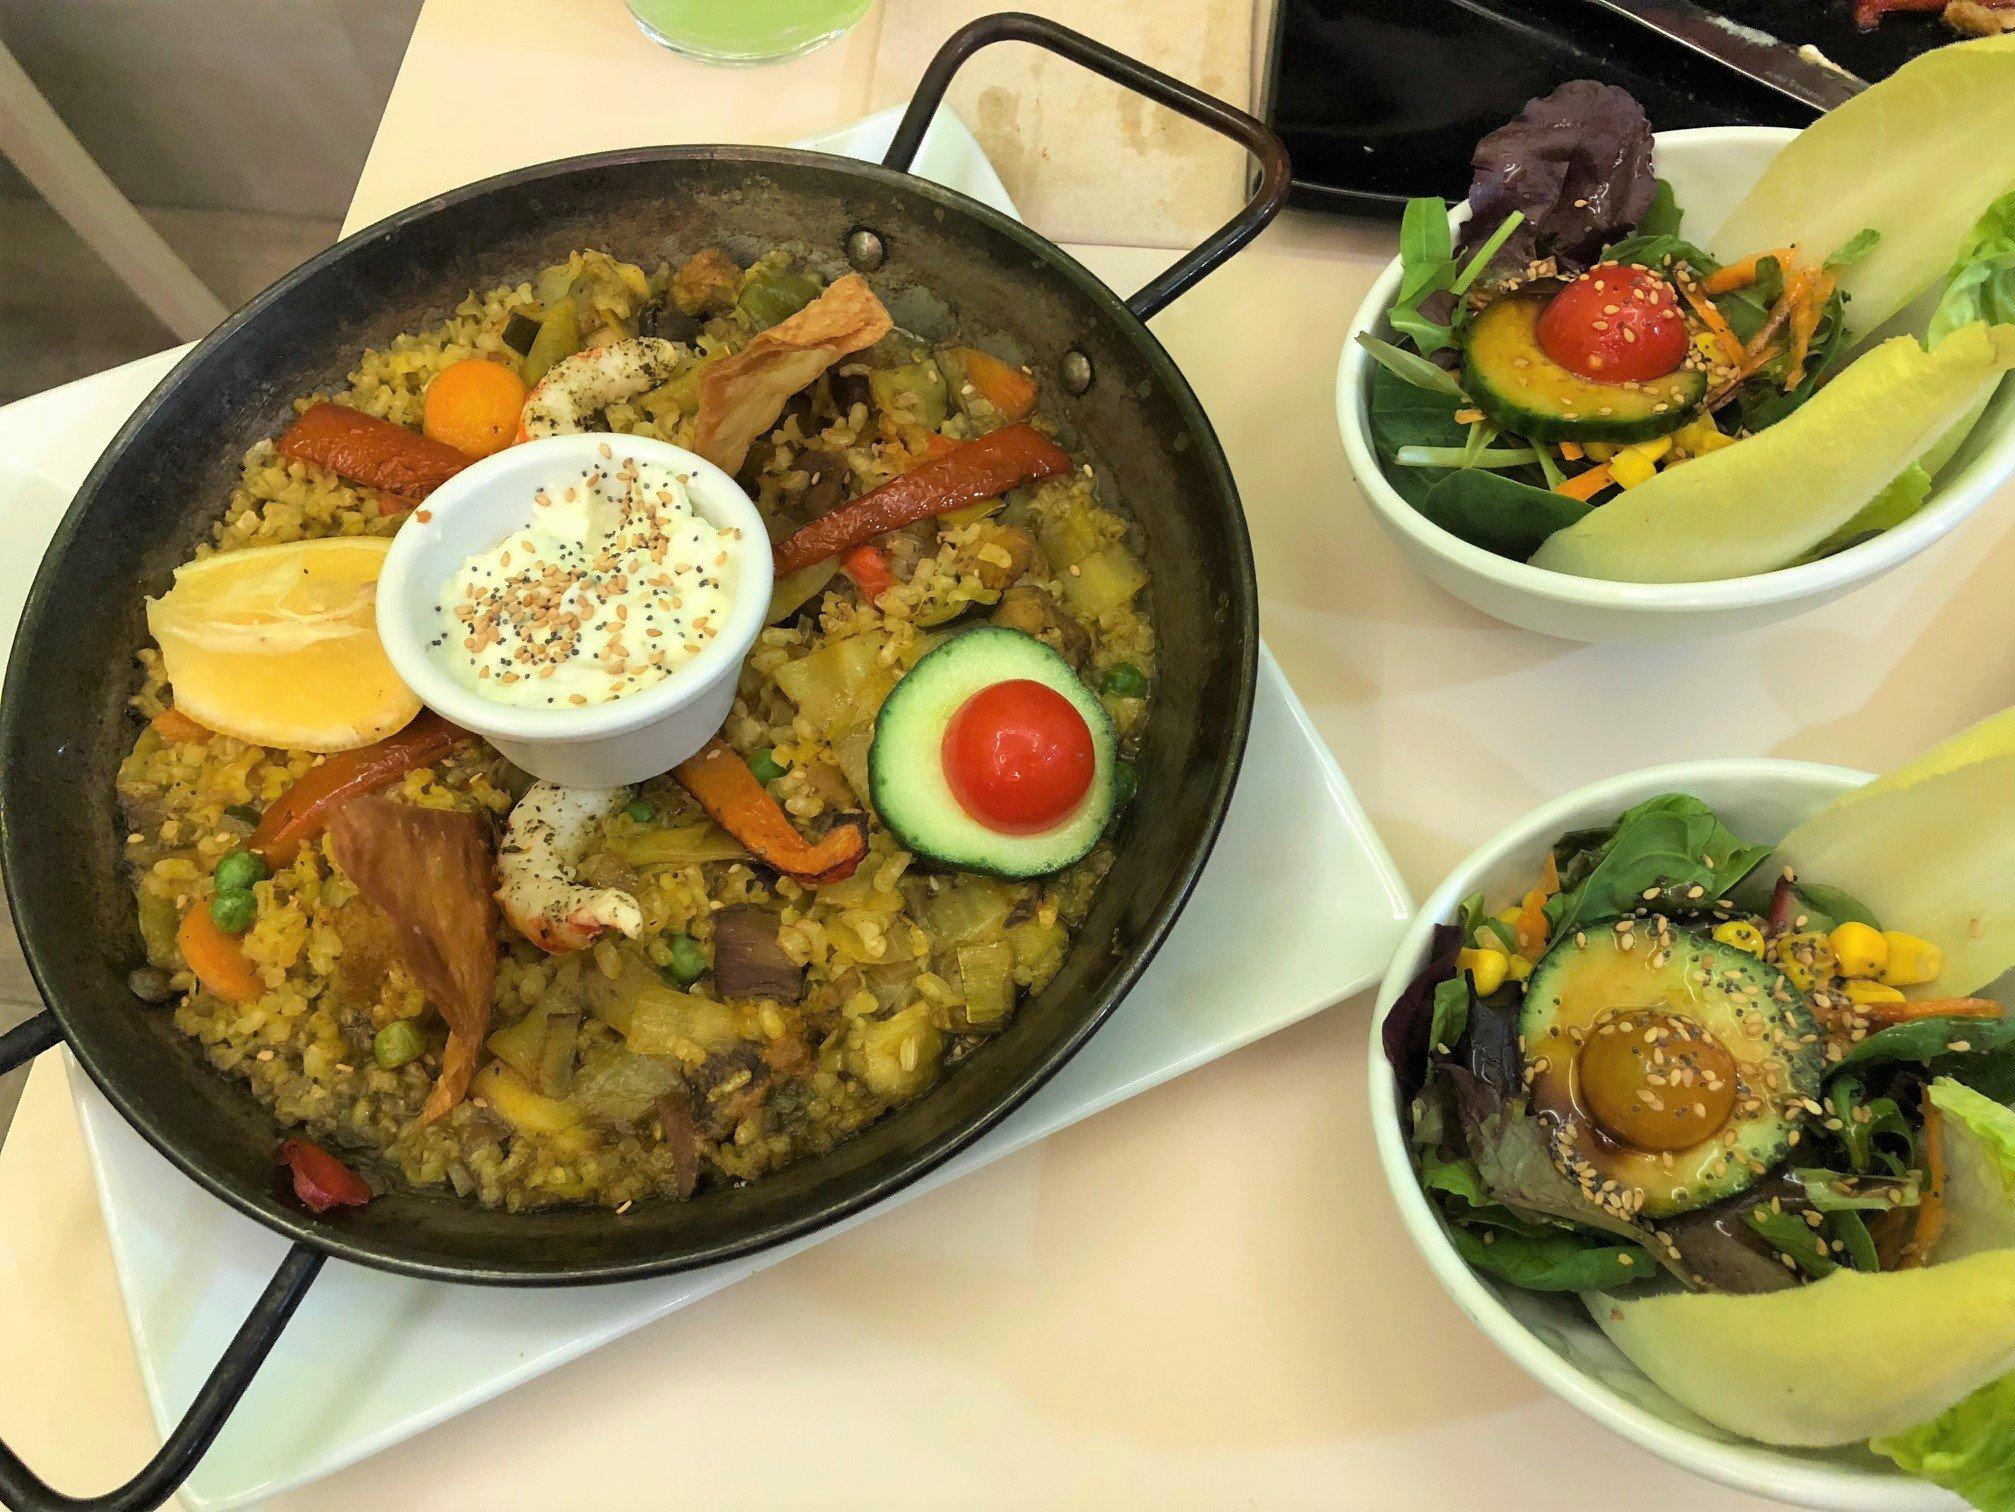 What better way to explore vegan travel than with vegan paella?